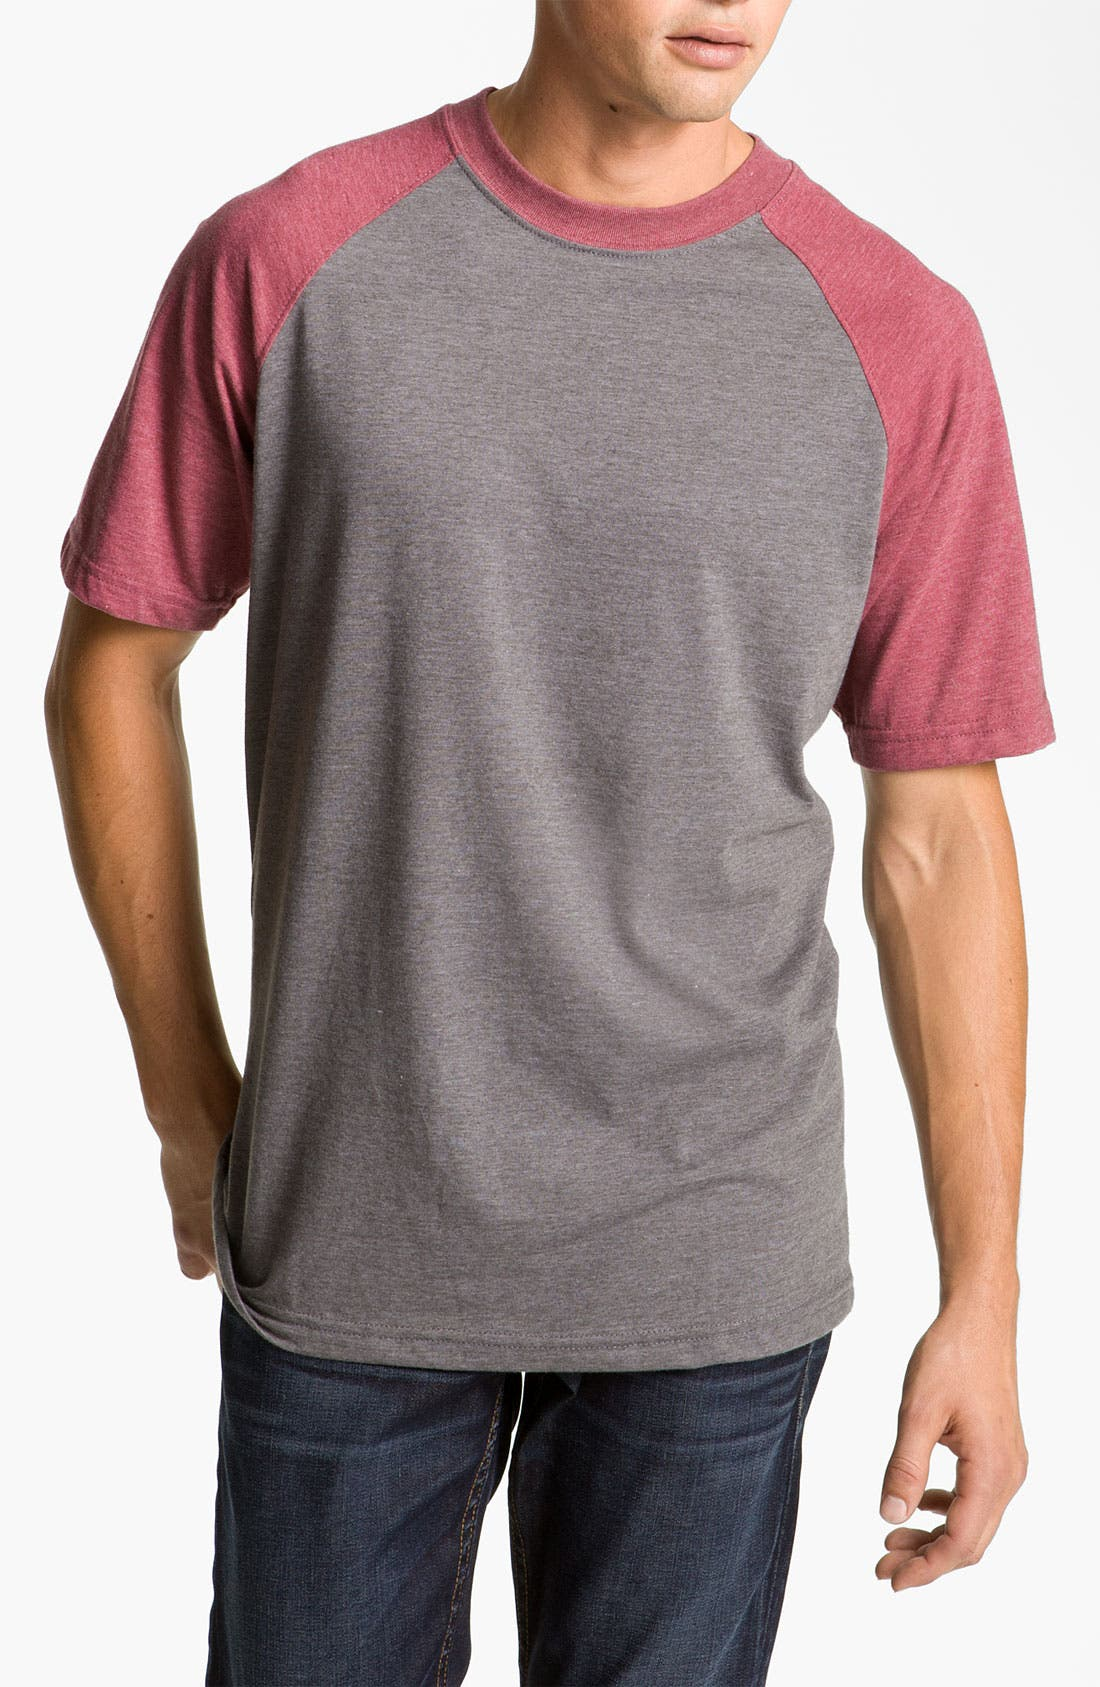 Alternate Image 1 Selected - RVCA 'Camby' Raglan Short Sleeve T-Shirt